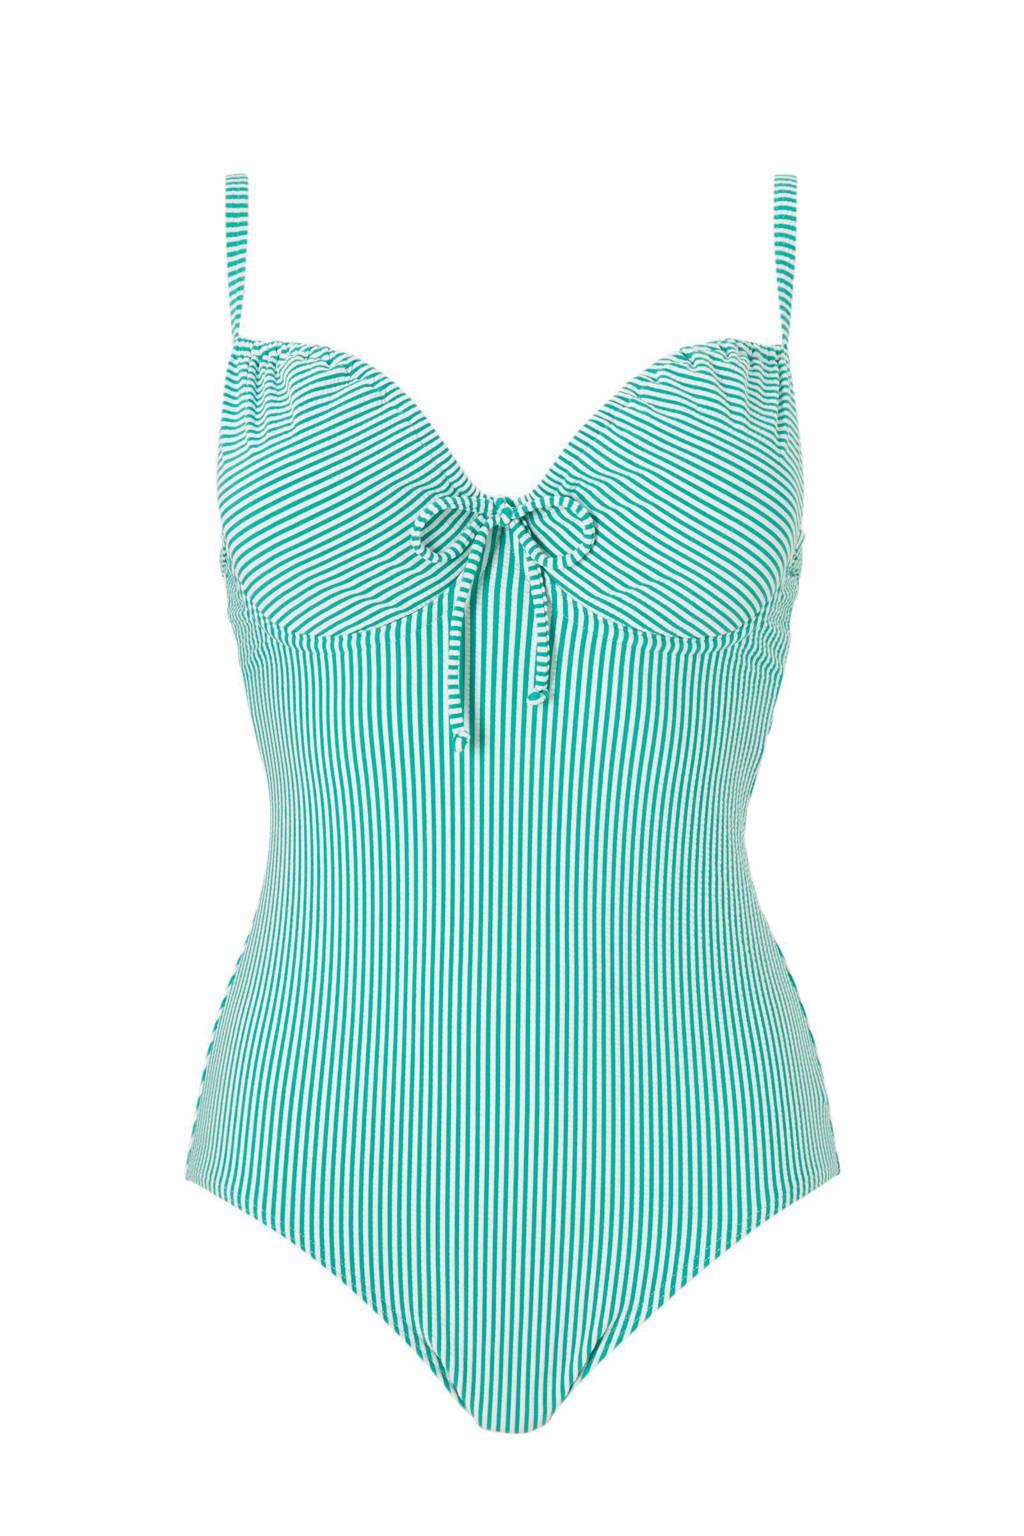 d31e6d14892854 whkmp's beachwave corrigerend badpak, Groen/wit